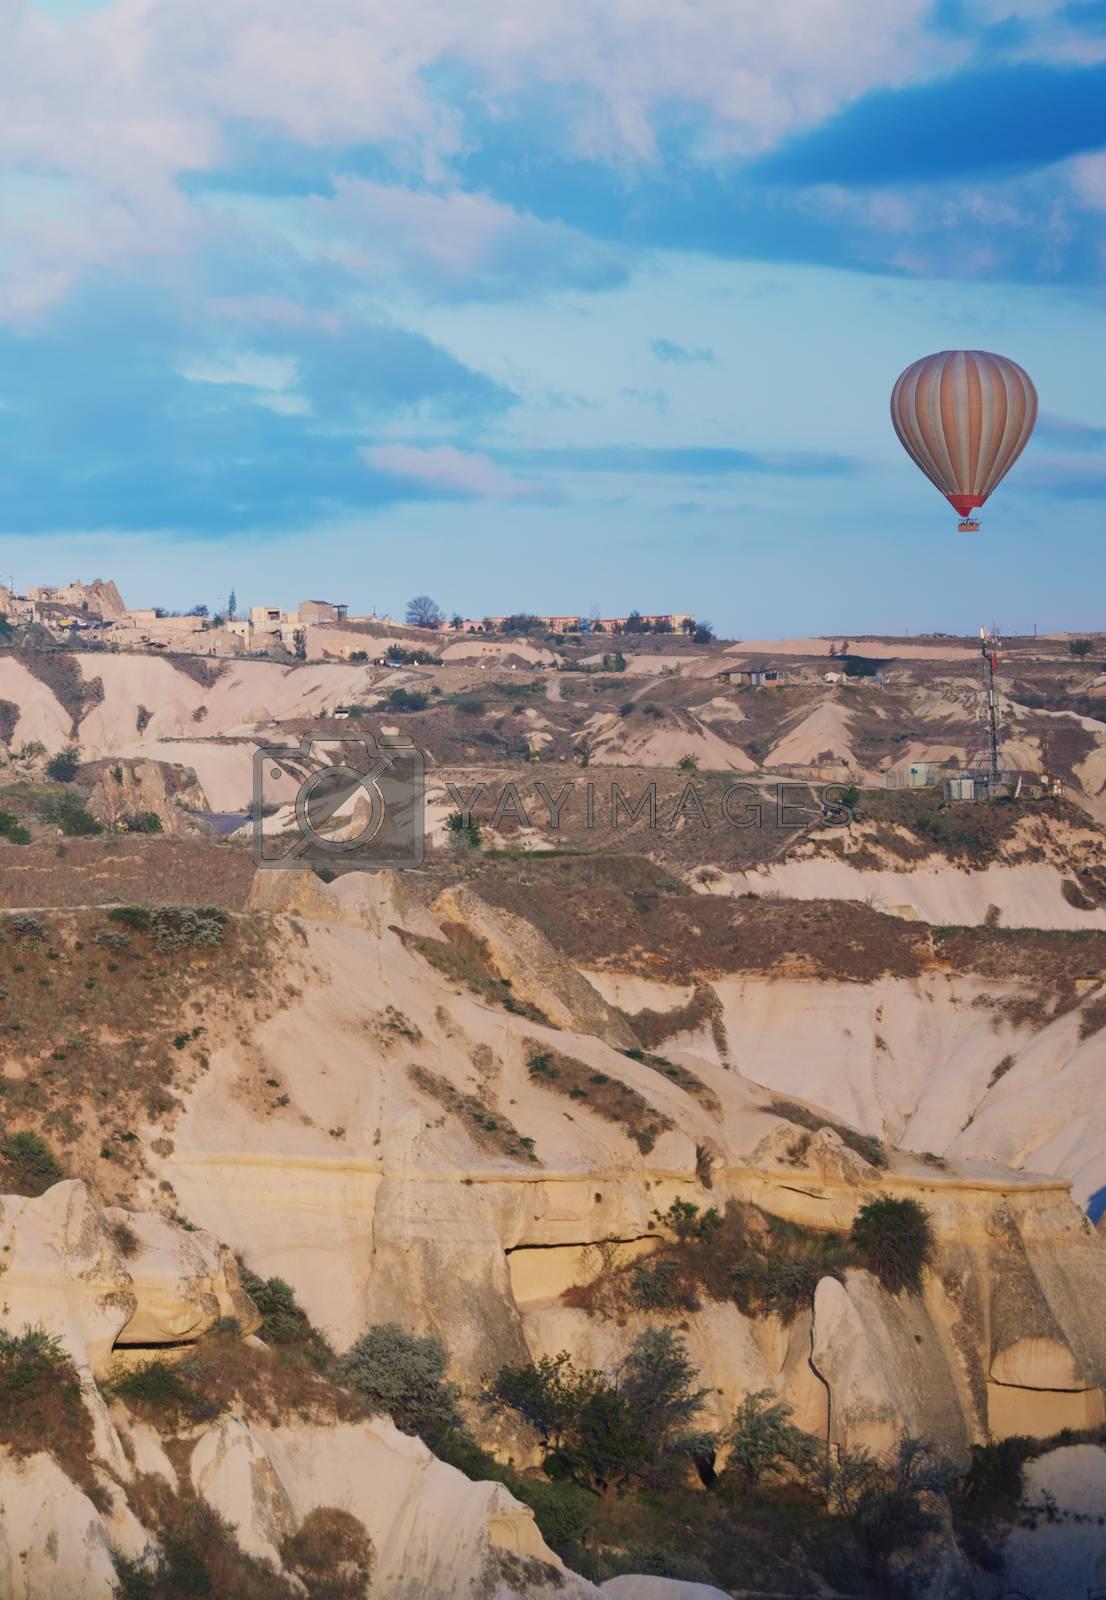 Hot air balloon flying over the rocks of Cappadocia, Turkey